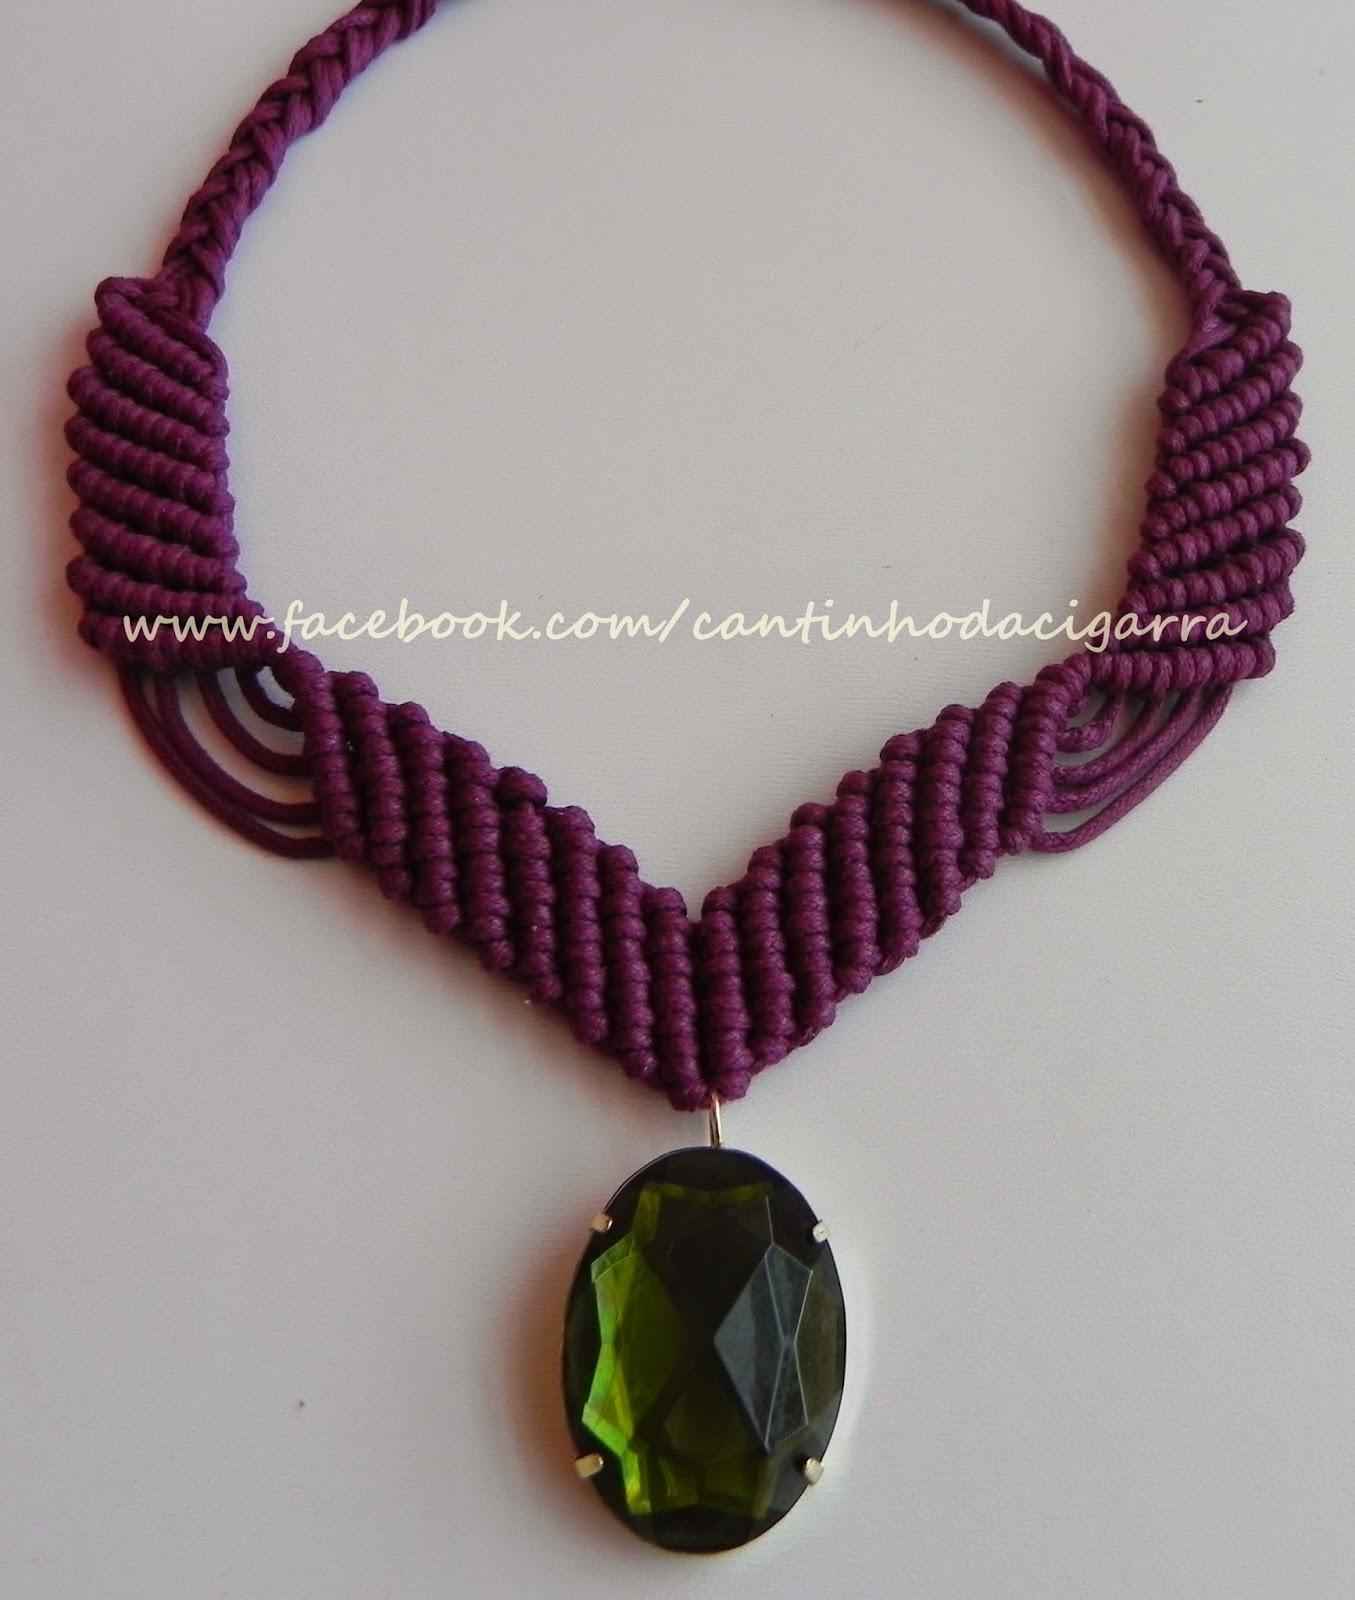 http://cantinhodacigarra.blogspot.com.br/p/pulseiras.html